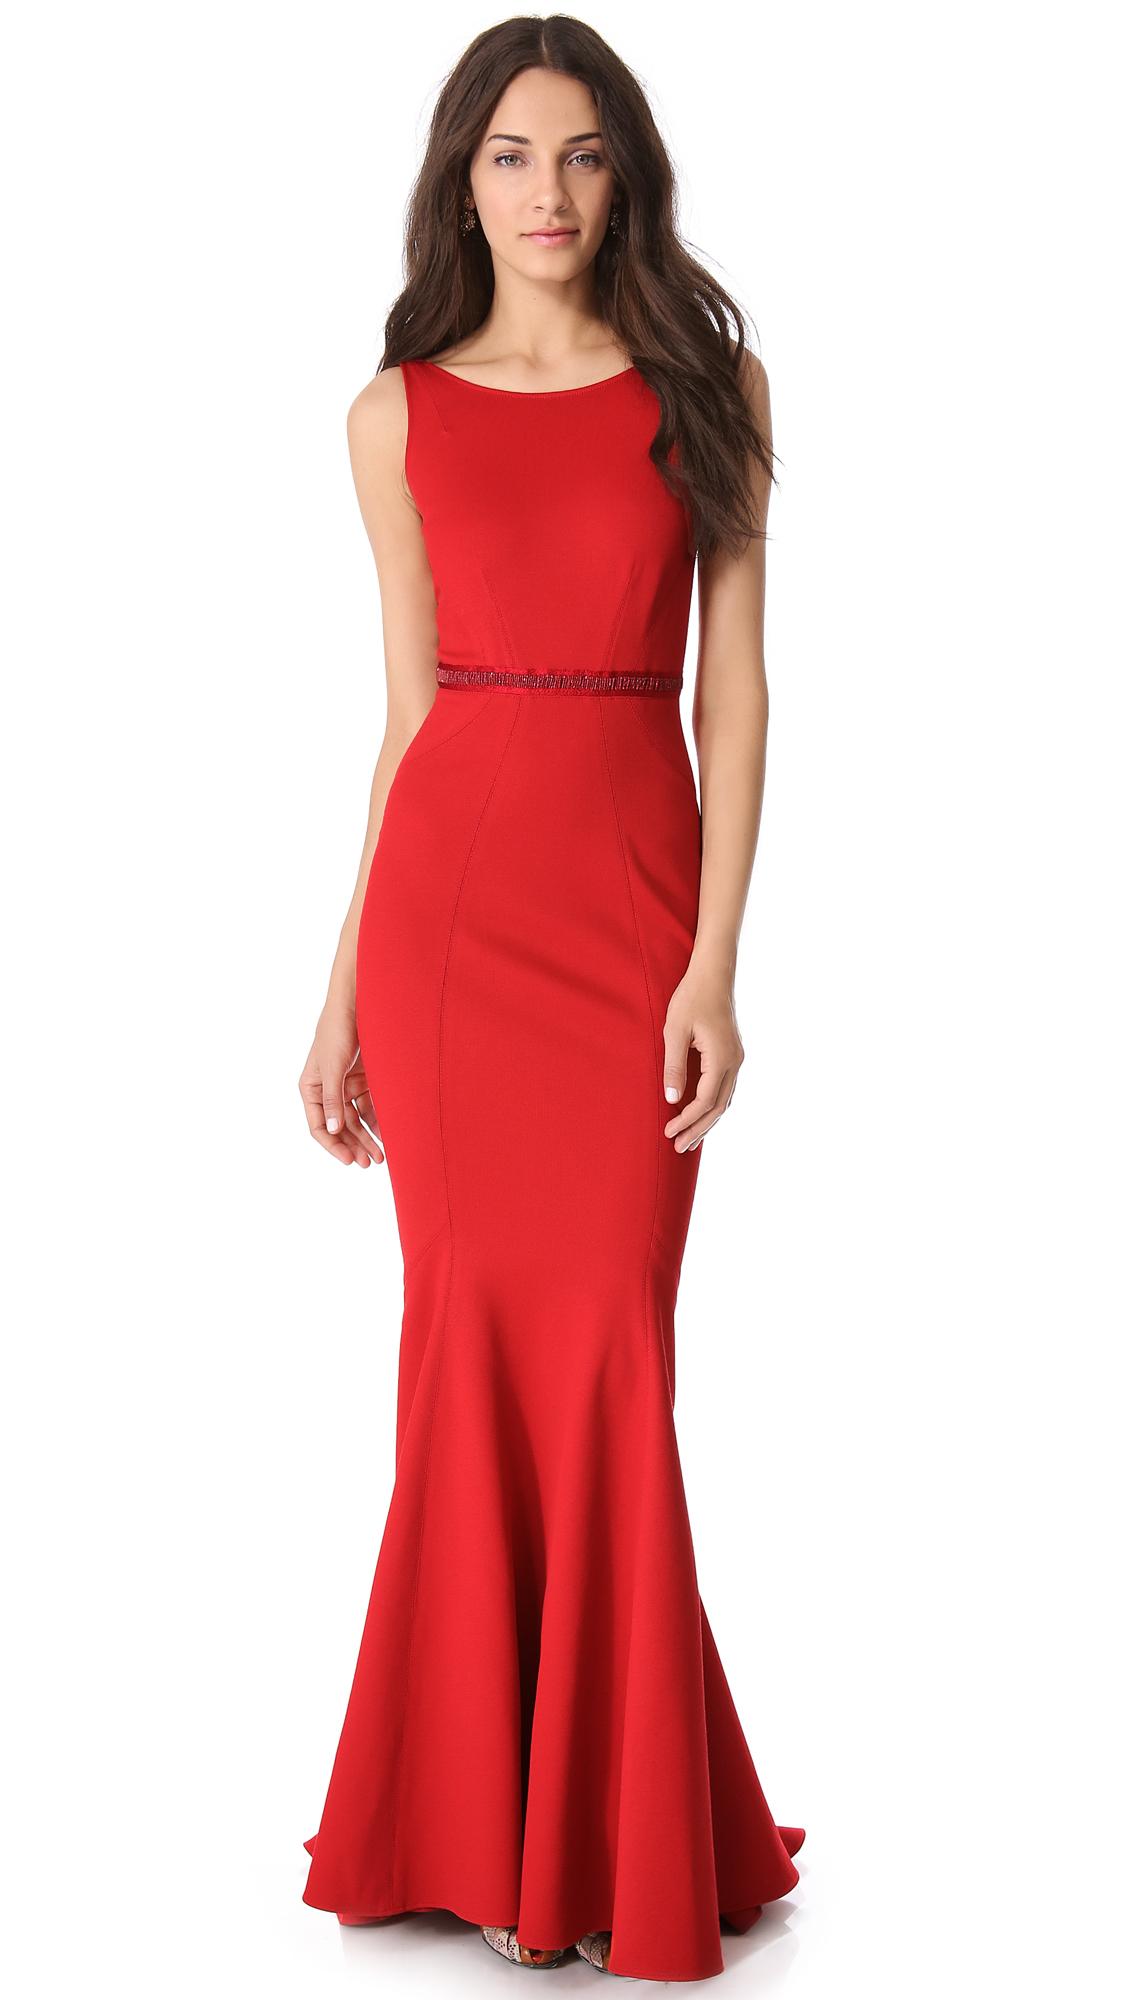 Lyst - Zac Posen Sleeveless Gown in Red